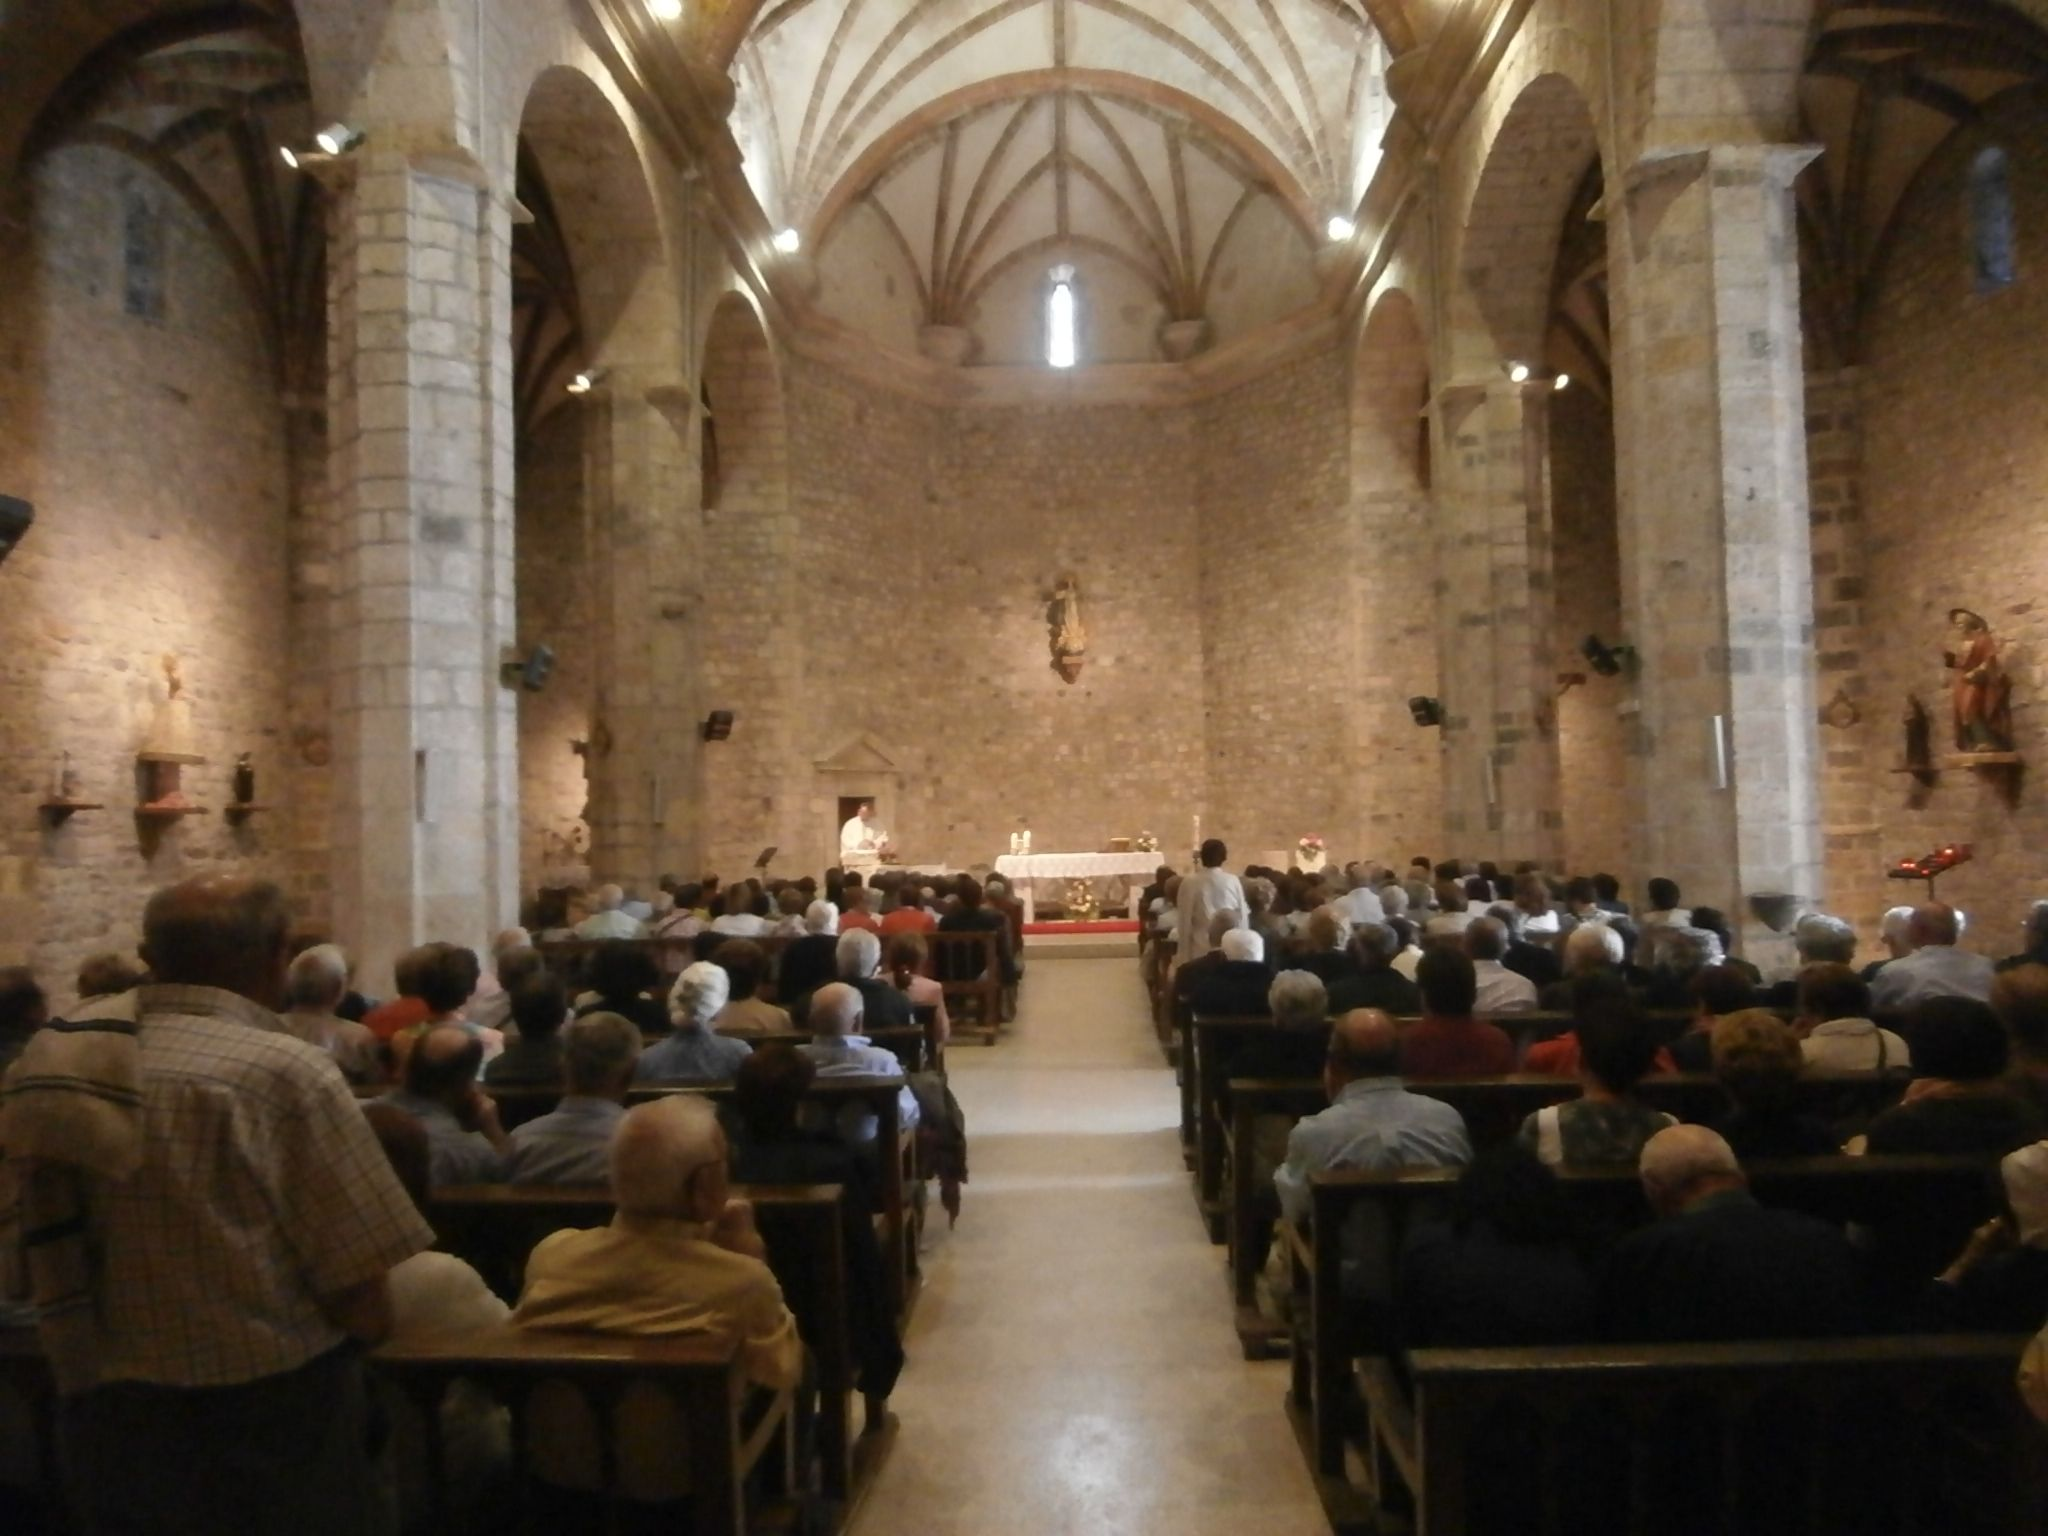 Interior de la iglesia de Bielsa. Foto: SobrarbeDigital